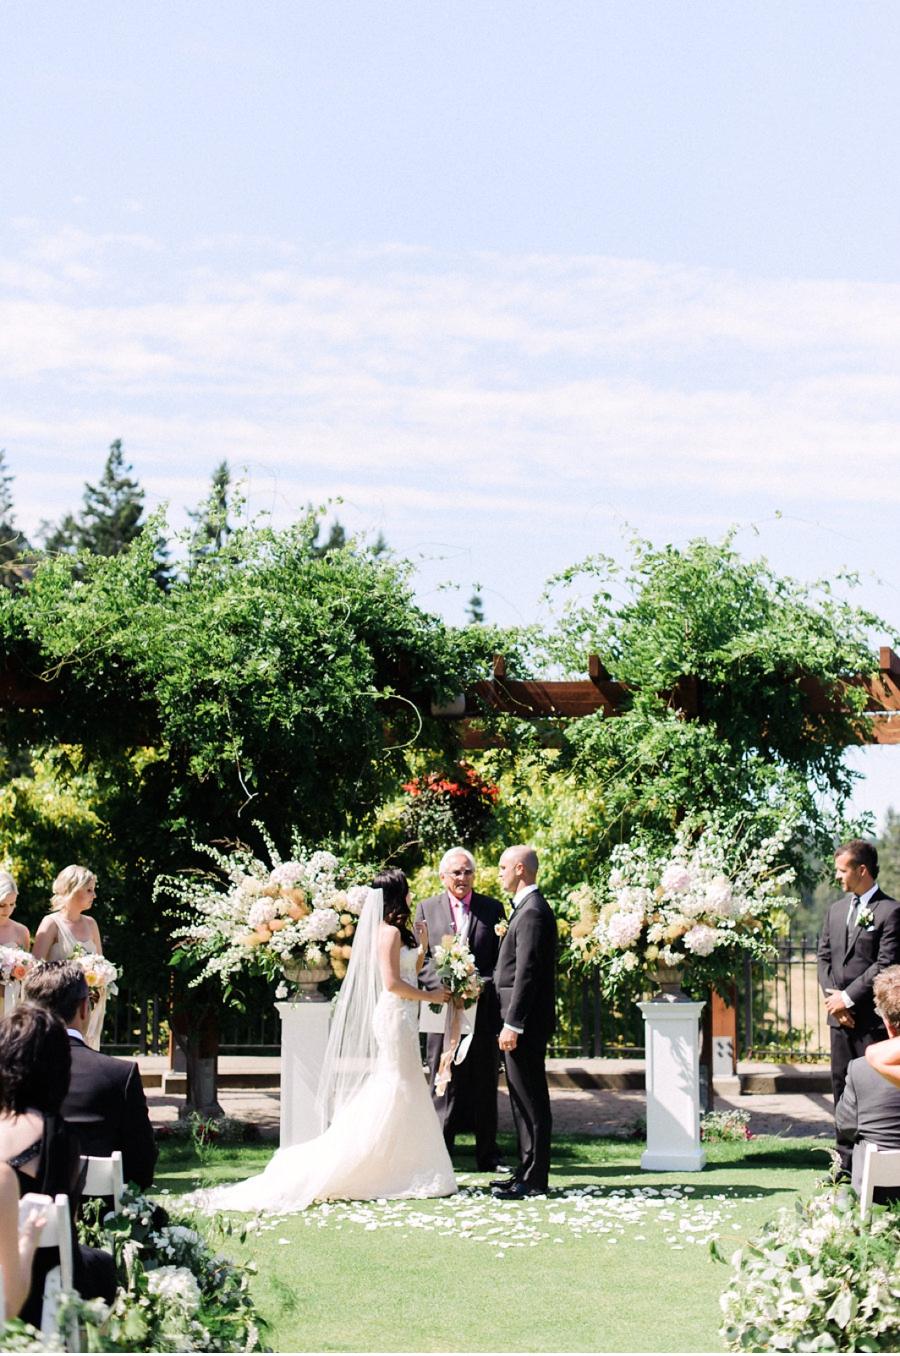 Bear-Mountain-Resort-Wedding-Ceremony